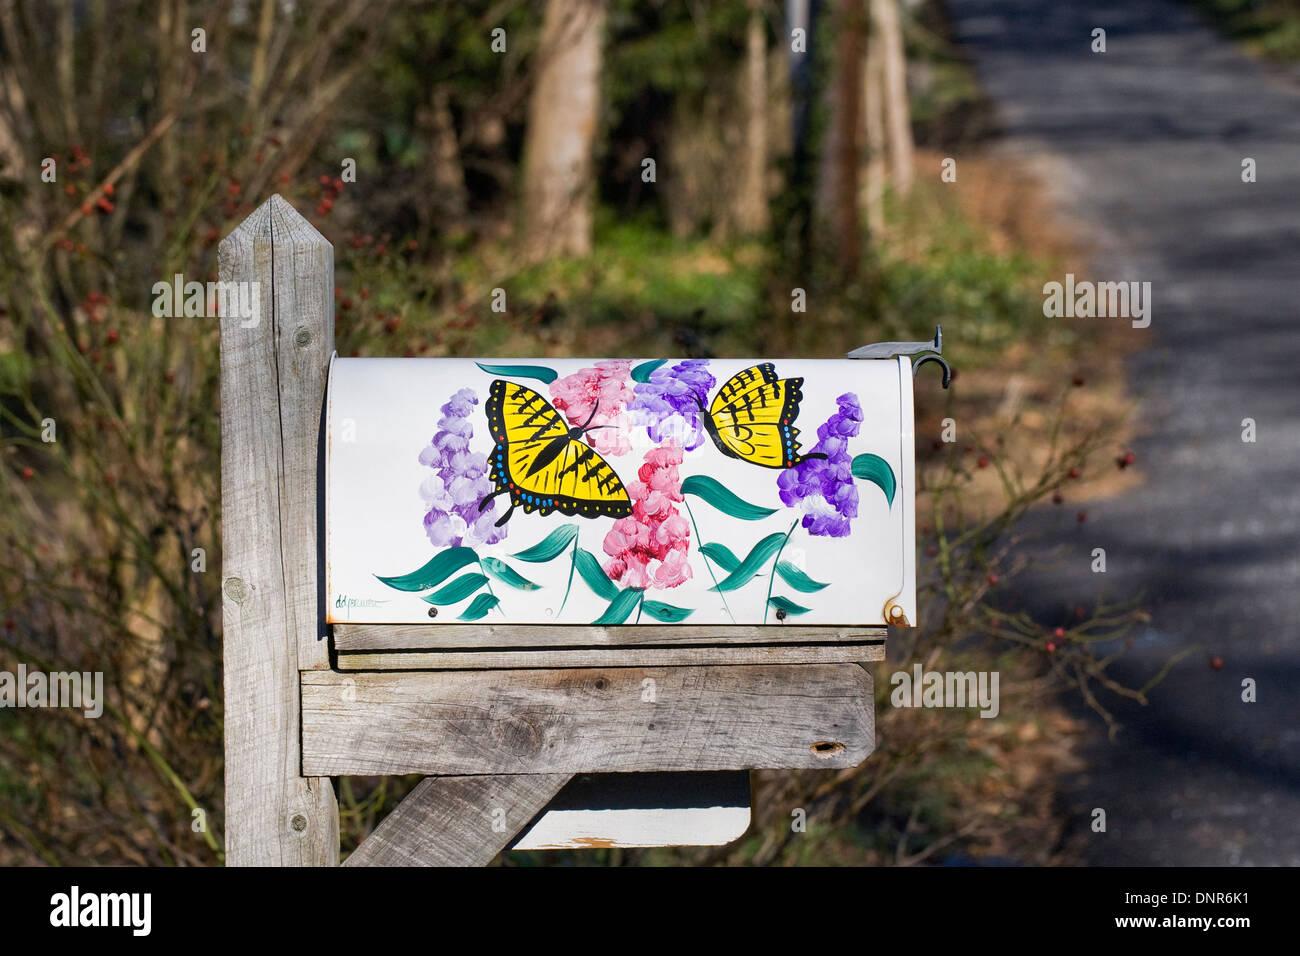 Decorative US mailbox. - Stock Image